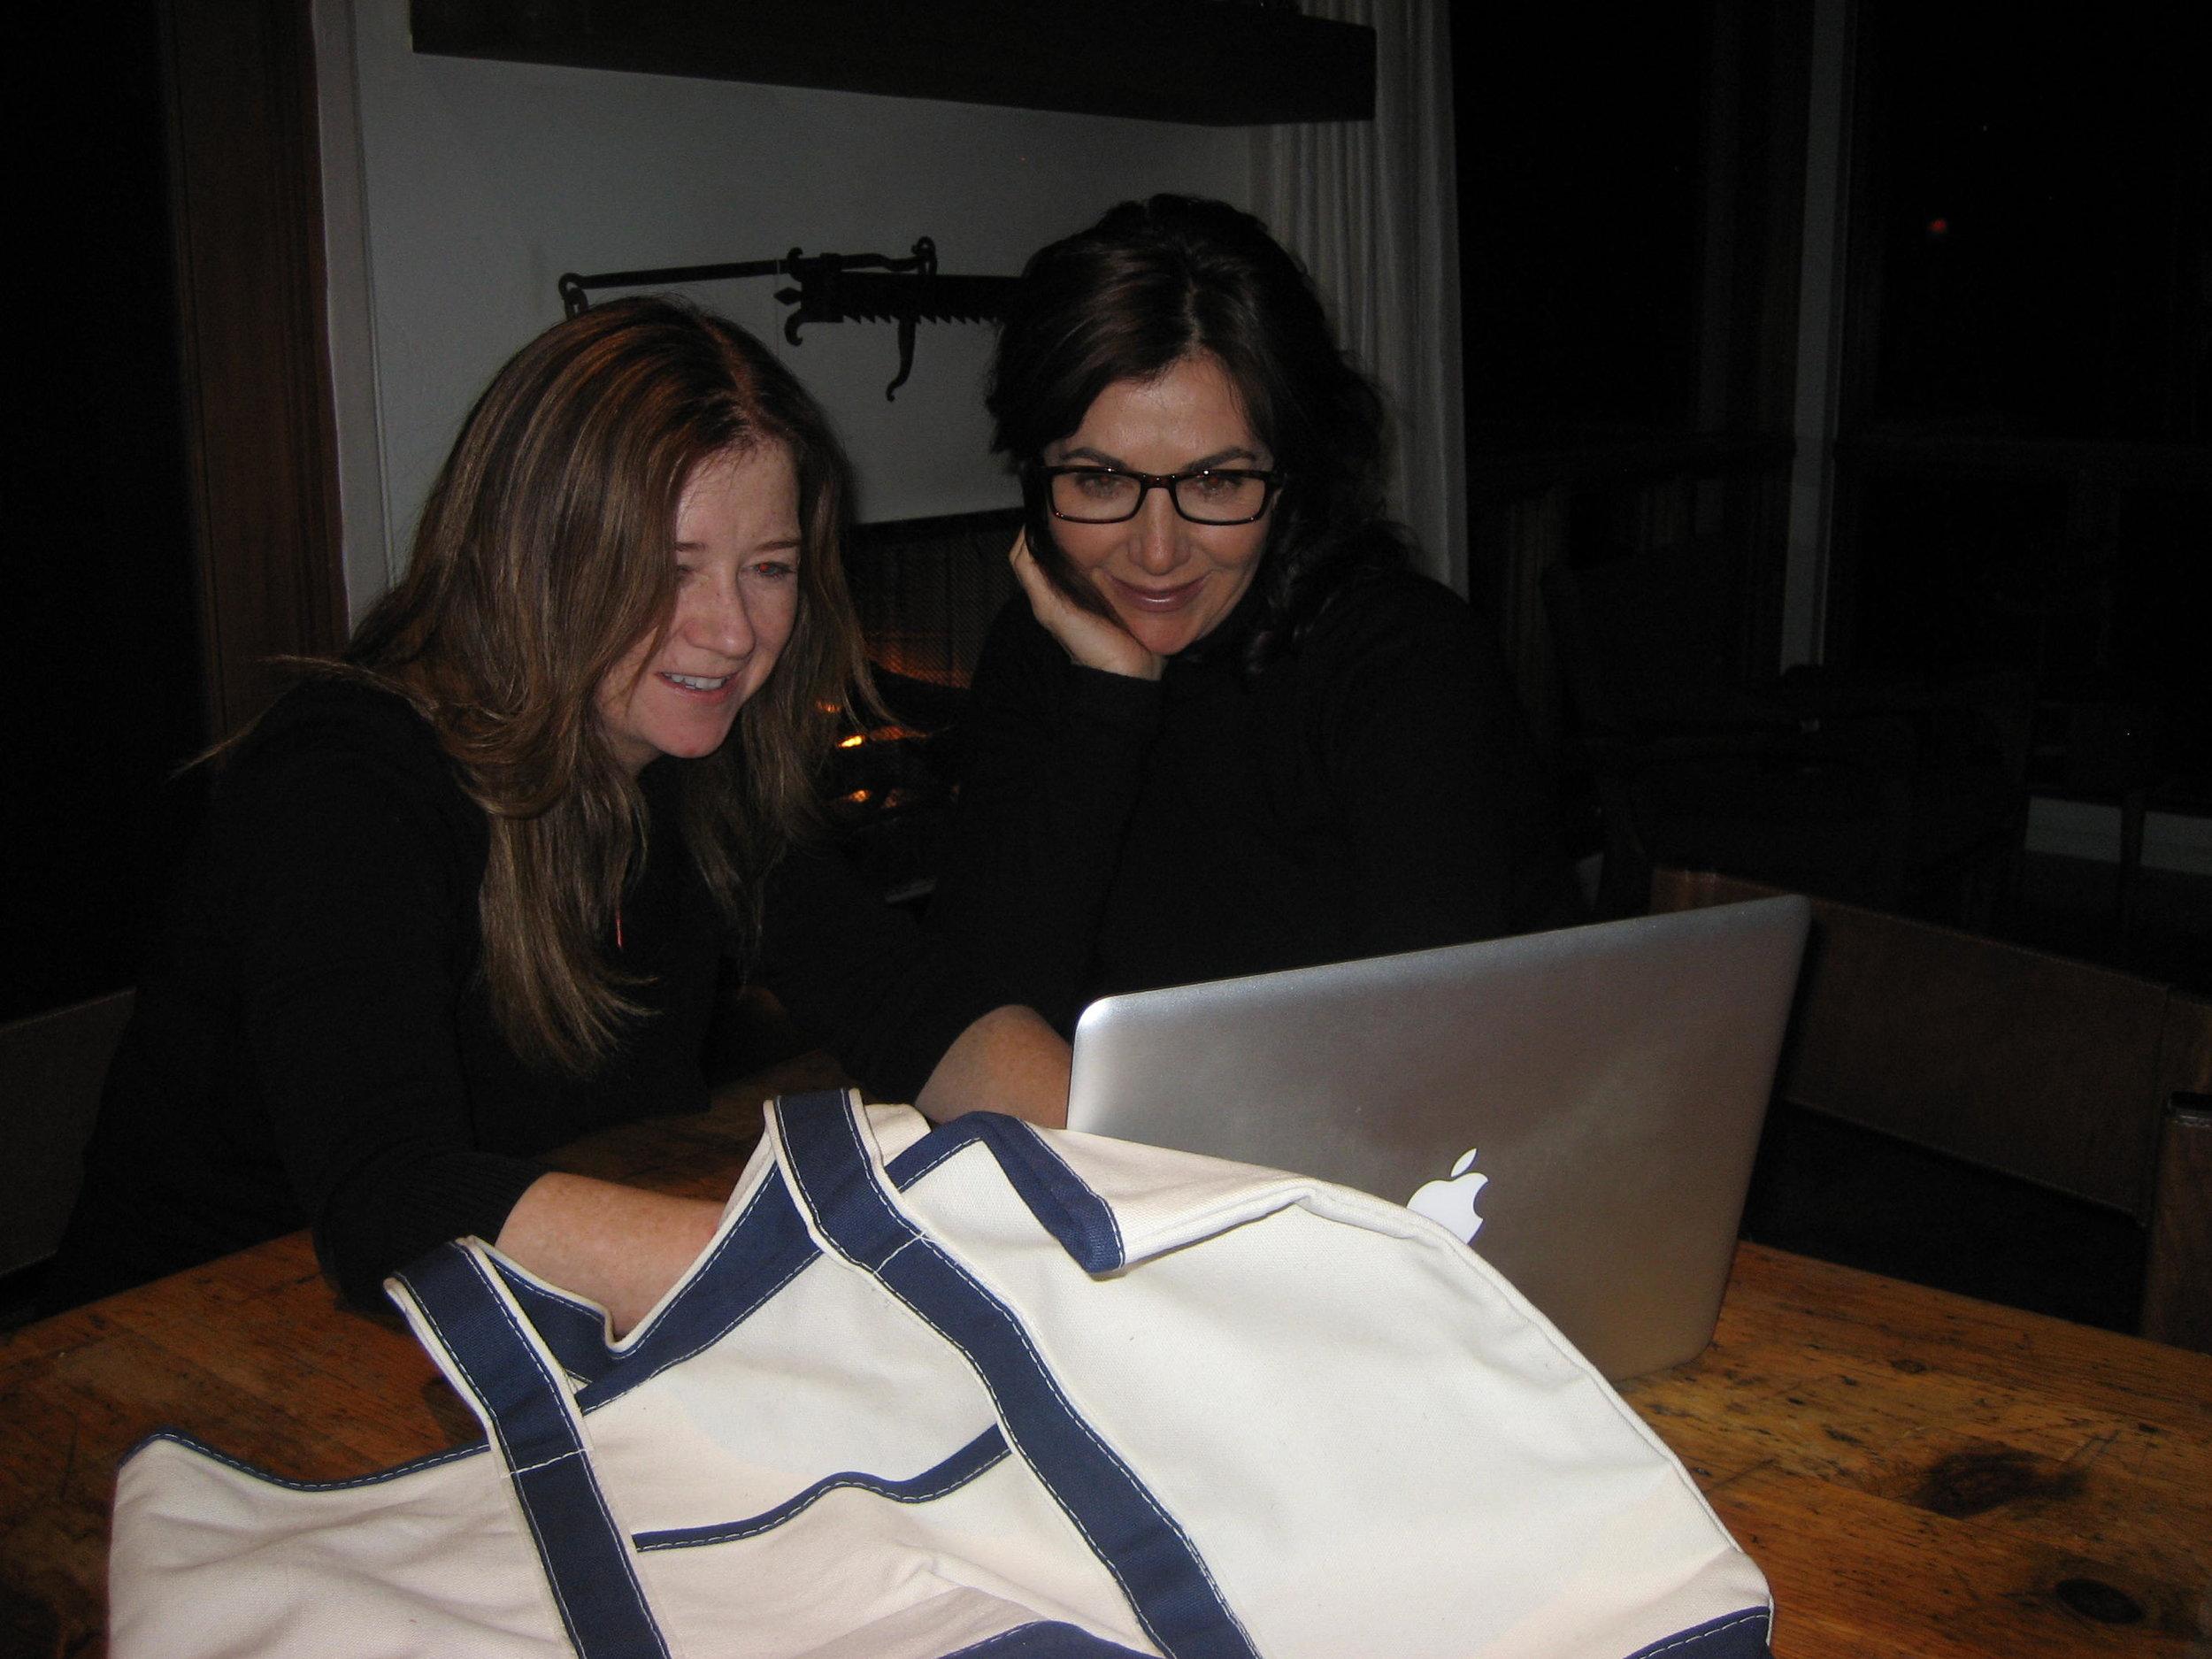 Kim-mcdonald-katie-viola-bag-design